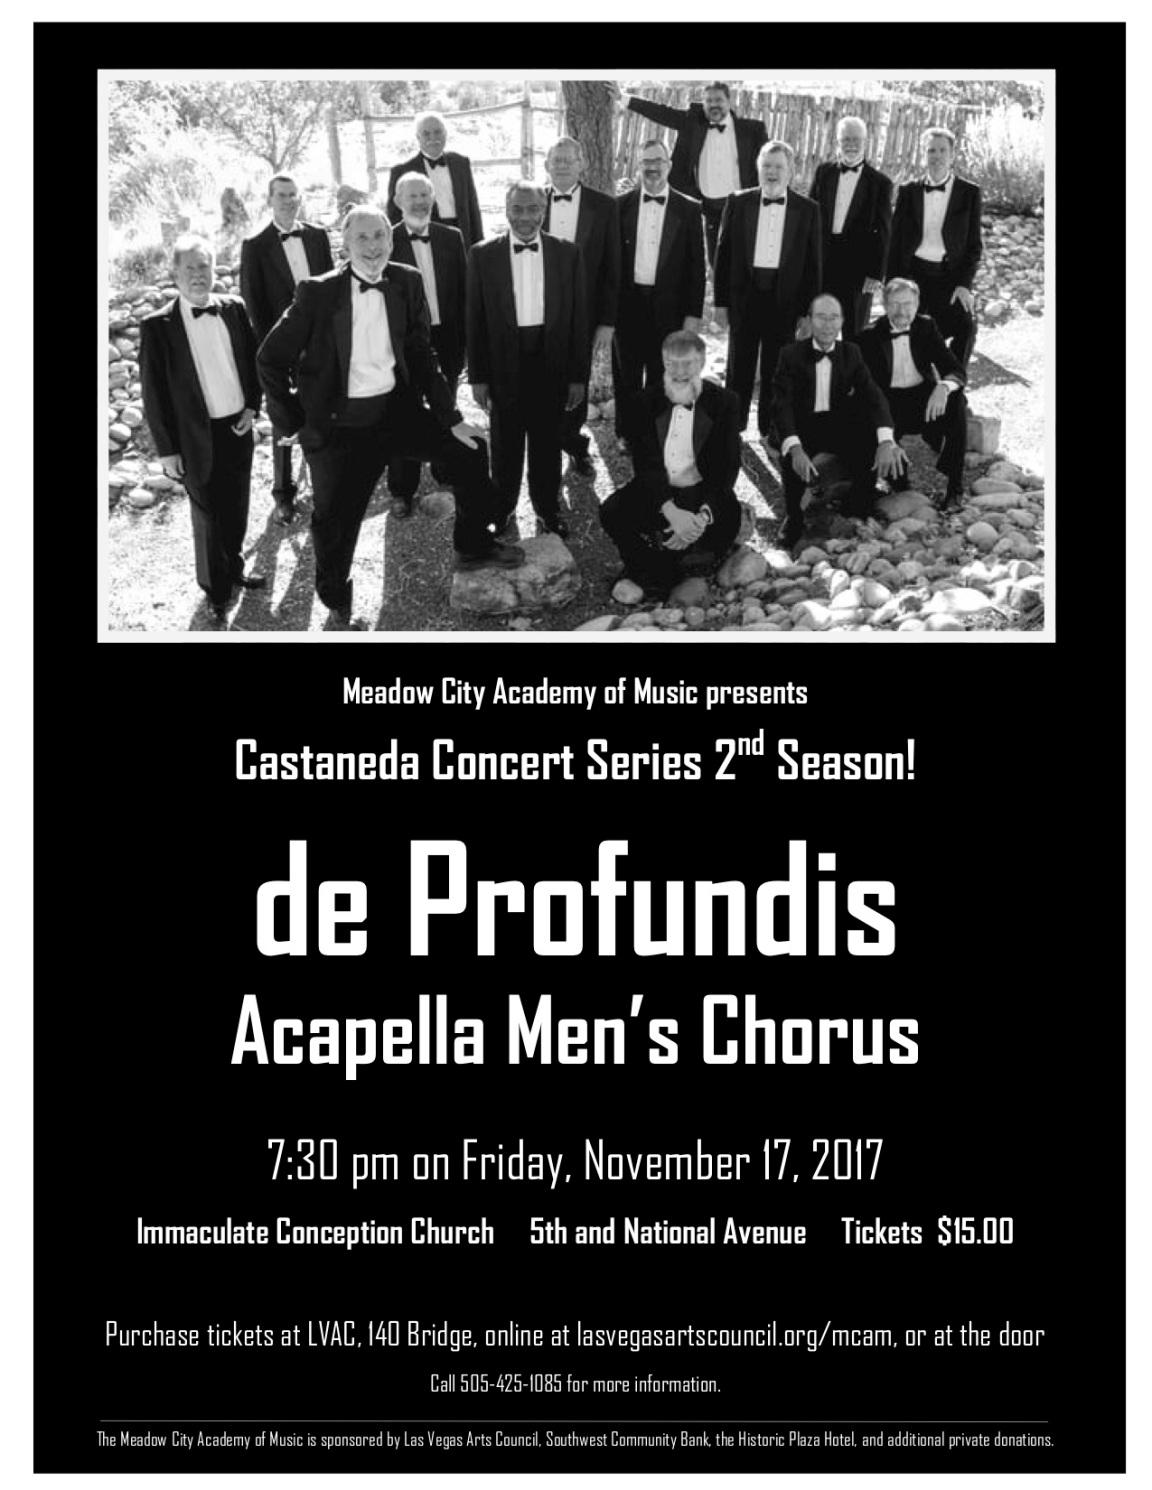 Meadow City Academy of Music de Profundis Concert Program